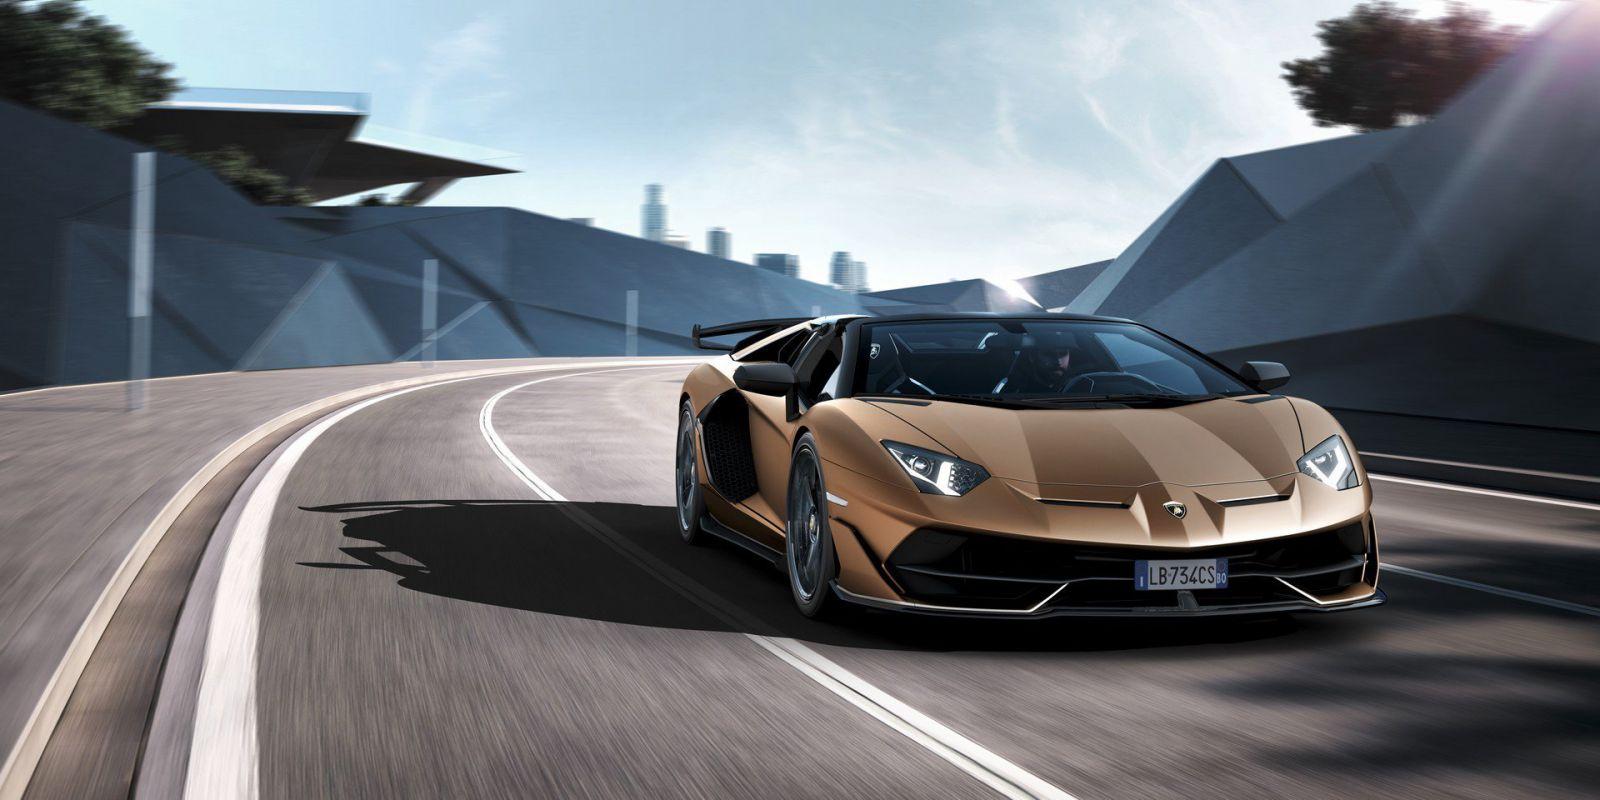 Ảnh đẹp xe Lamborghini cực chất